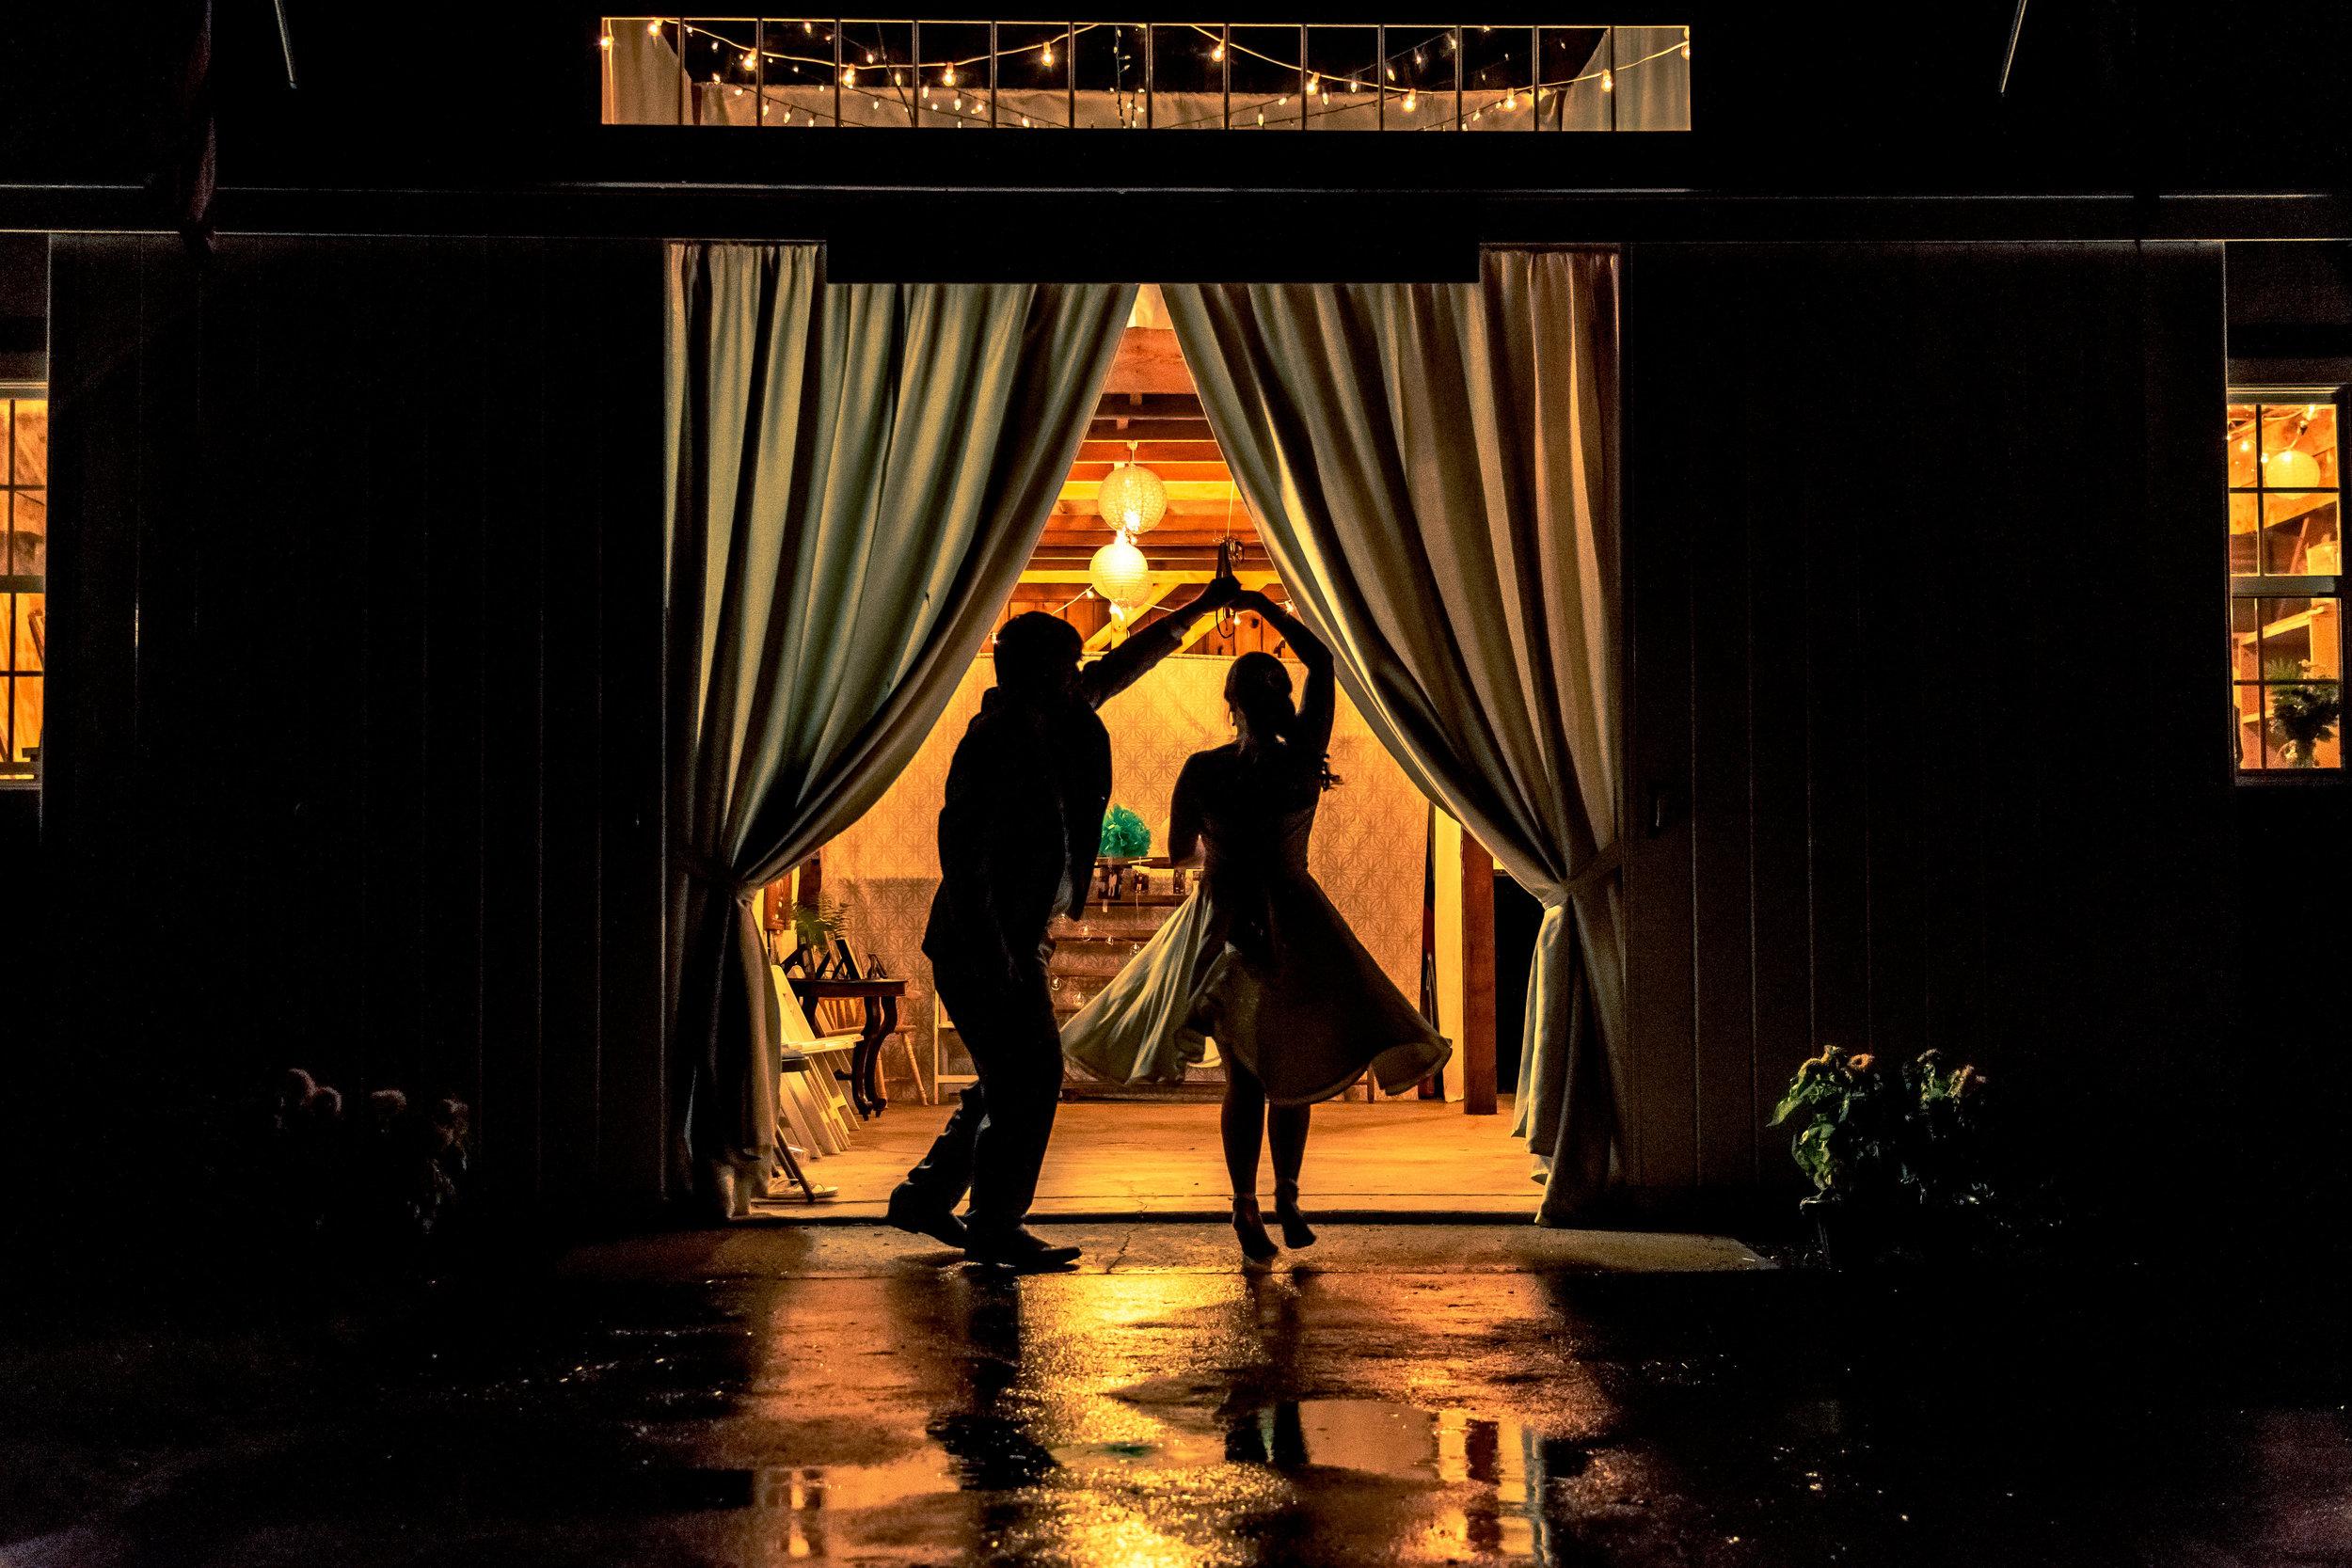 Ariele and Josh swing dancing